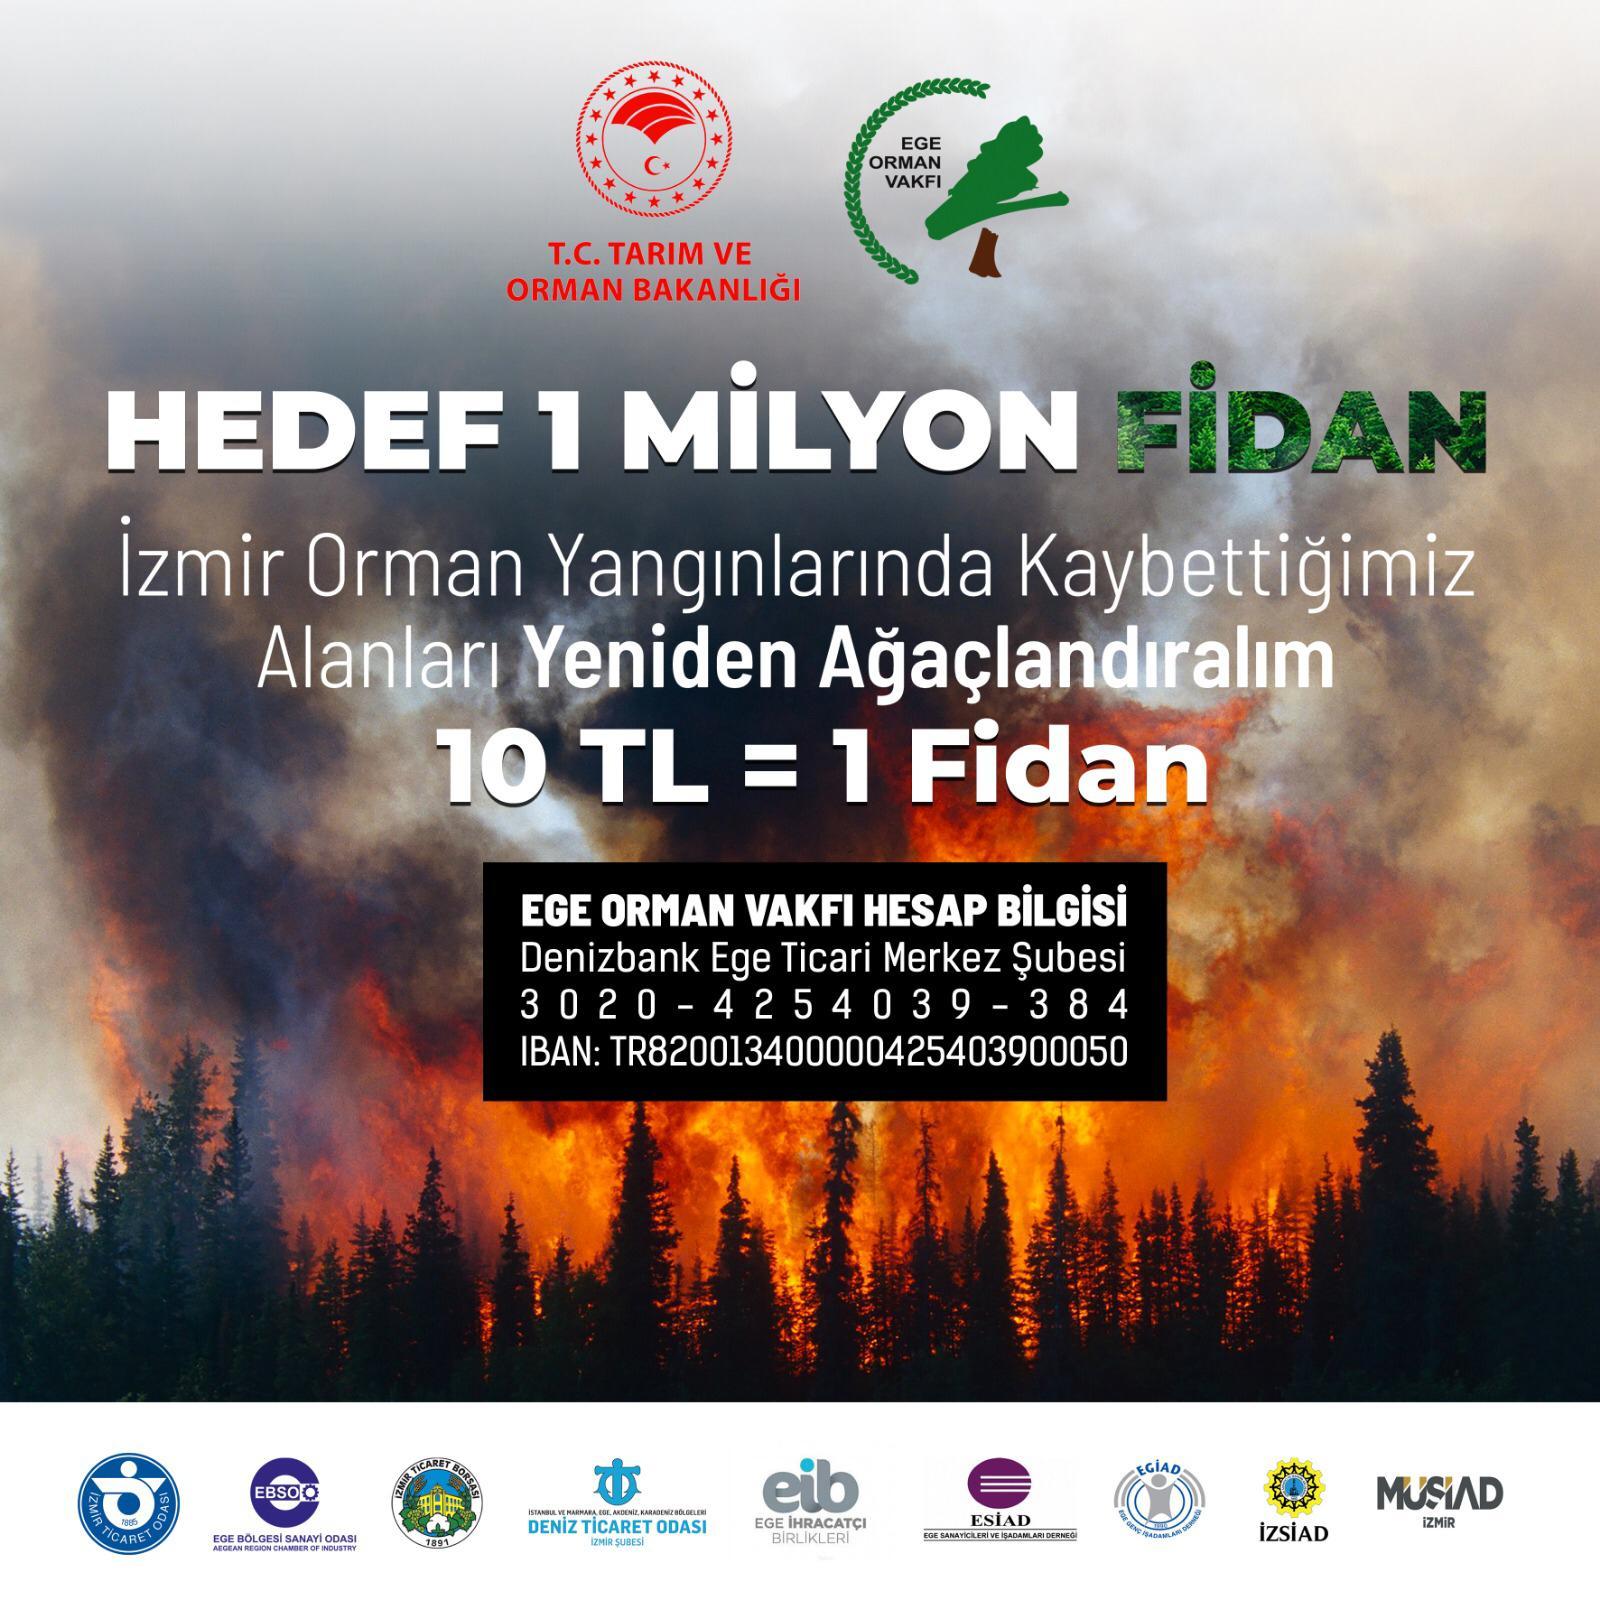 HEDEF 1 MİLYON FİDAN